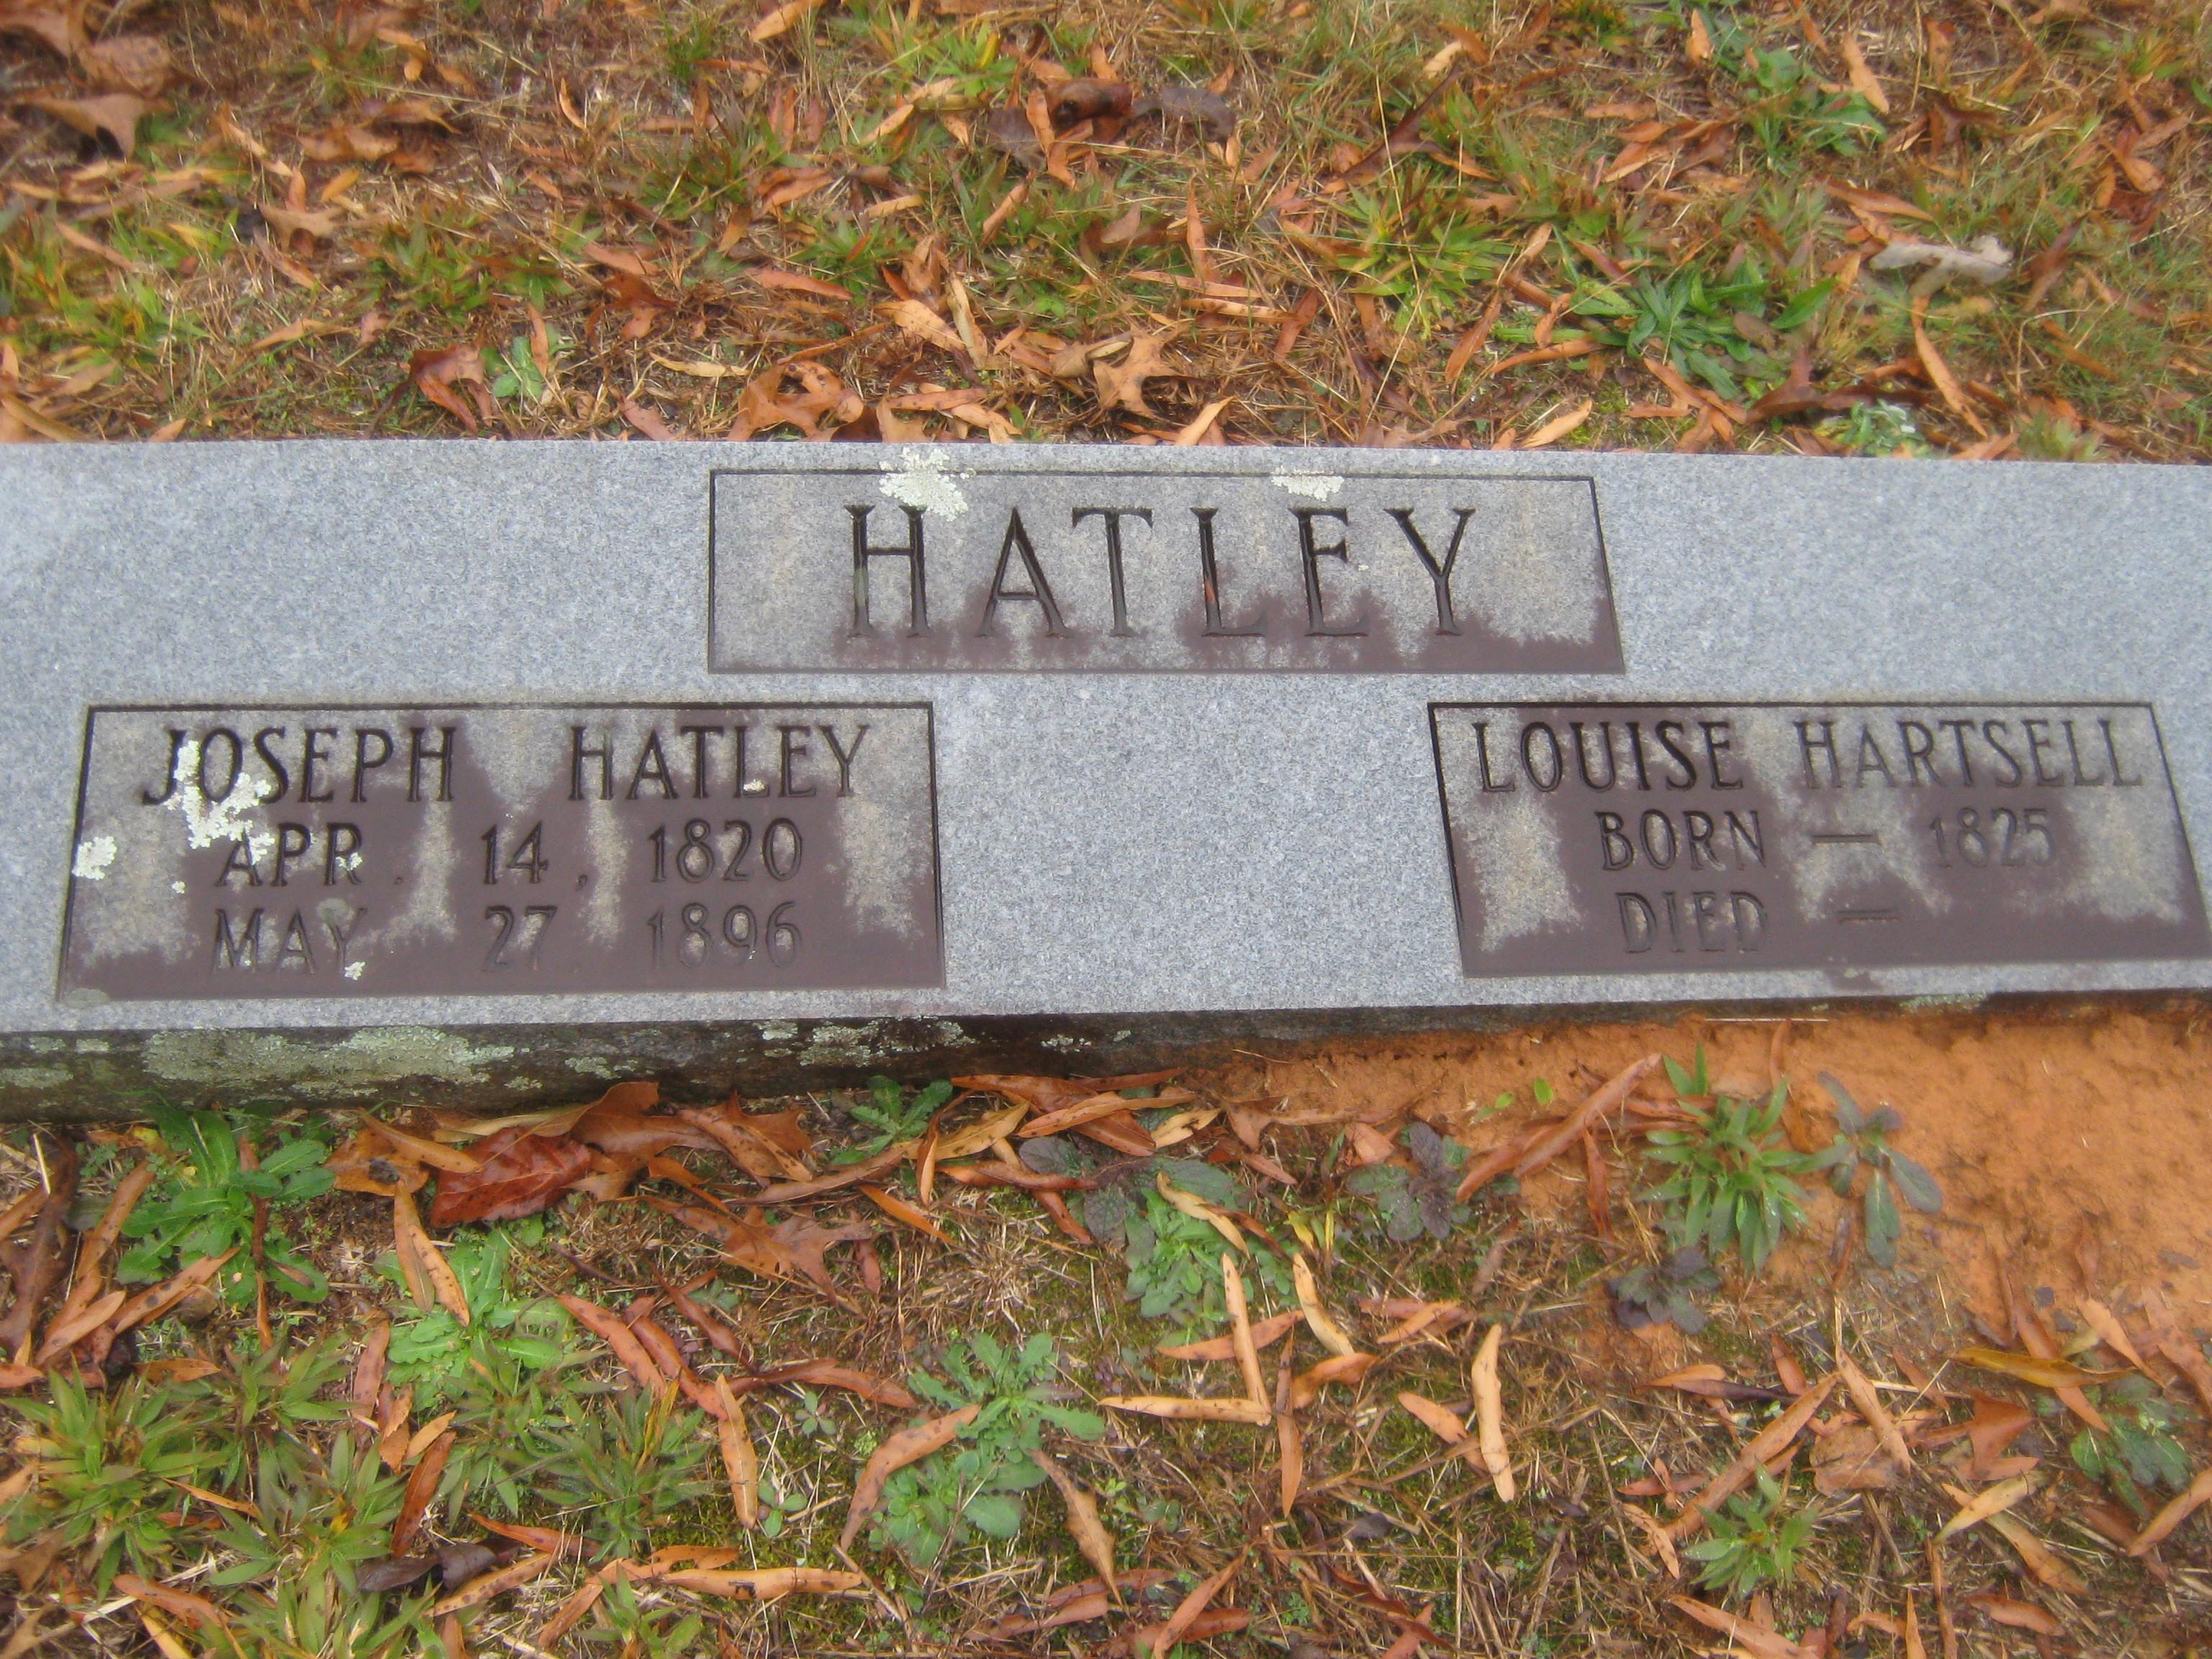 Joseph Hatley